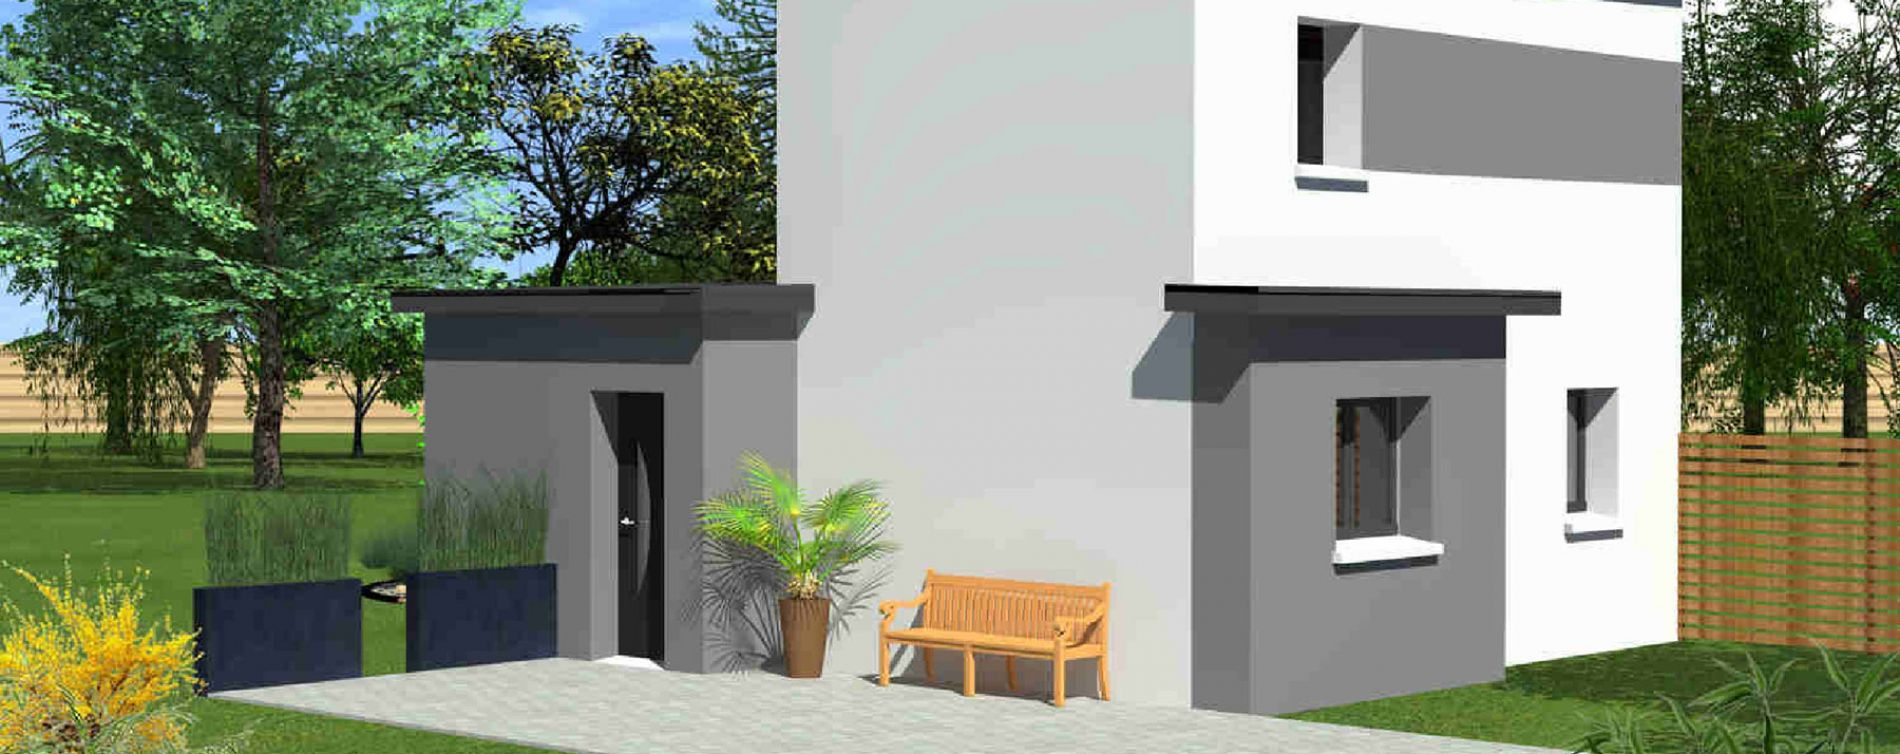 Ploudalmézeau : programme immobilier neuve « Roscaroc » (3)